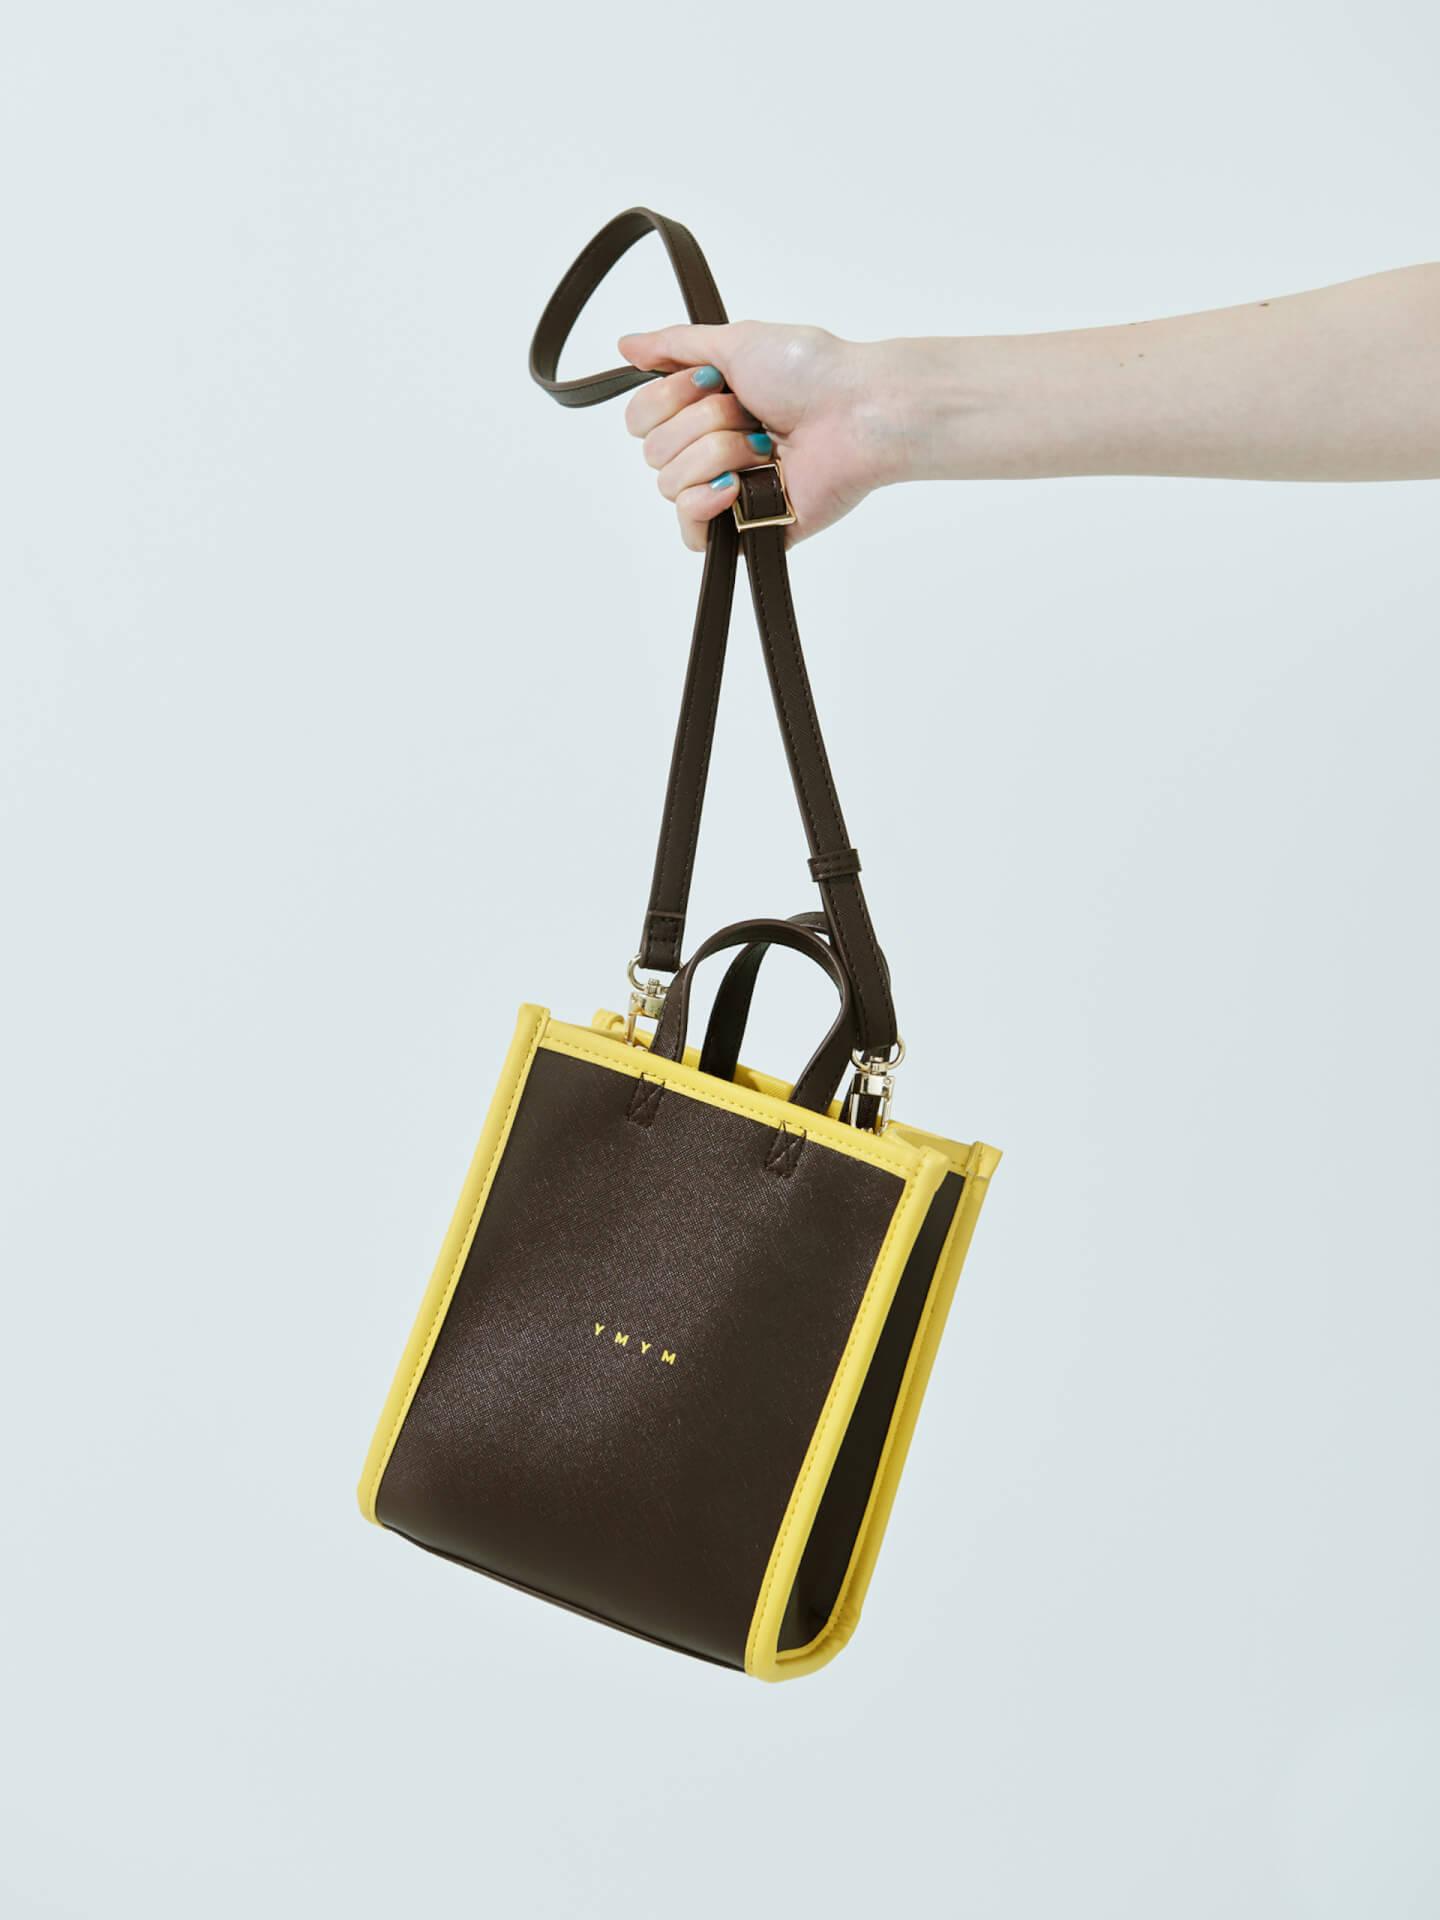 CHAIのベーシスト・YUUKIによるプロジェクト「YMYM」よりファッションブランドオープン!2021年春夏コレクション&描き下ろし絵画などの展示会も life210405_ymym_11